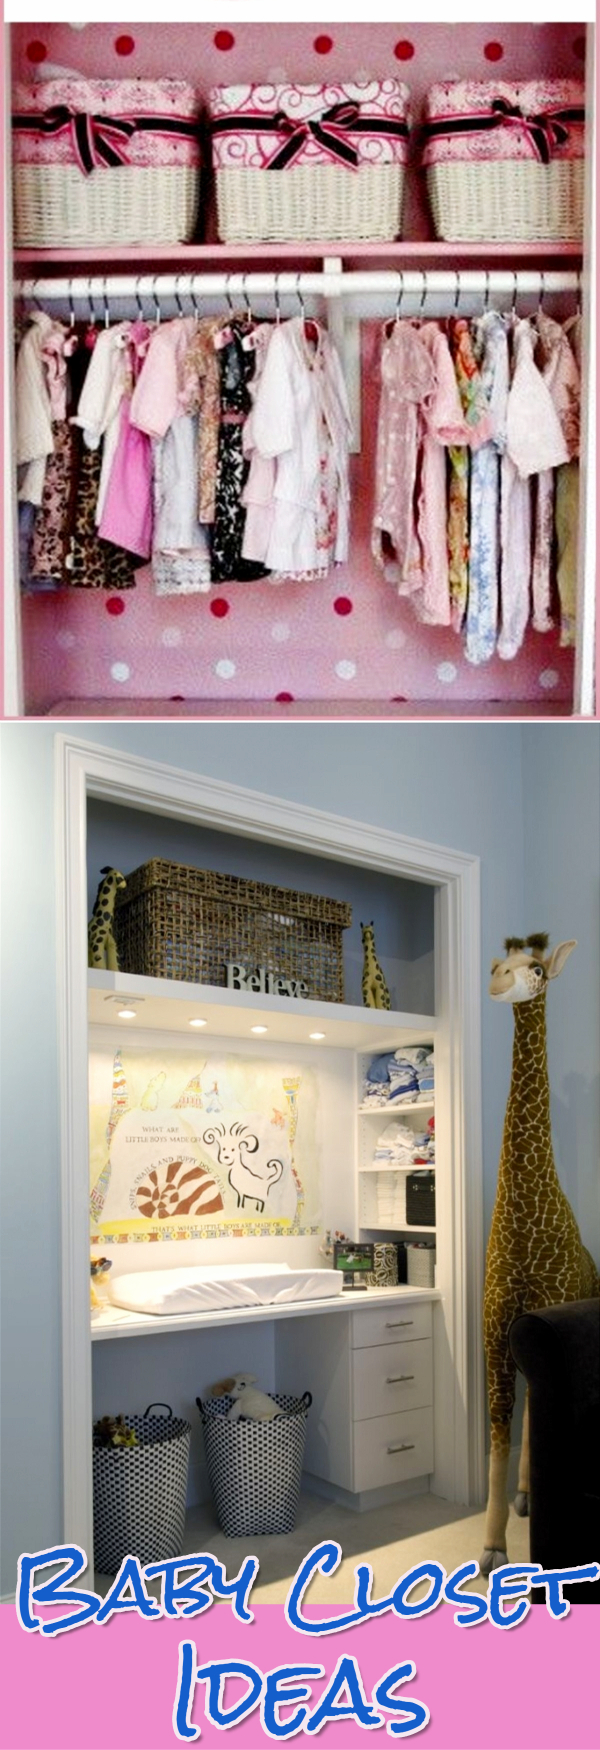 Baby Closet Organization Ideas   How To Organize The Baby Closet   DIY Nursery  Closet Organization